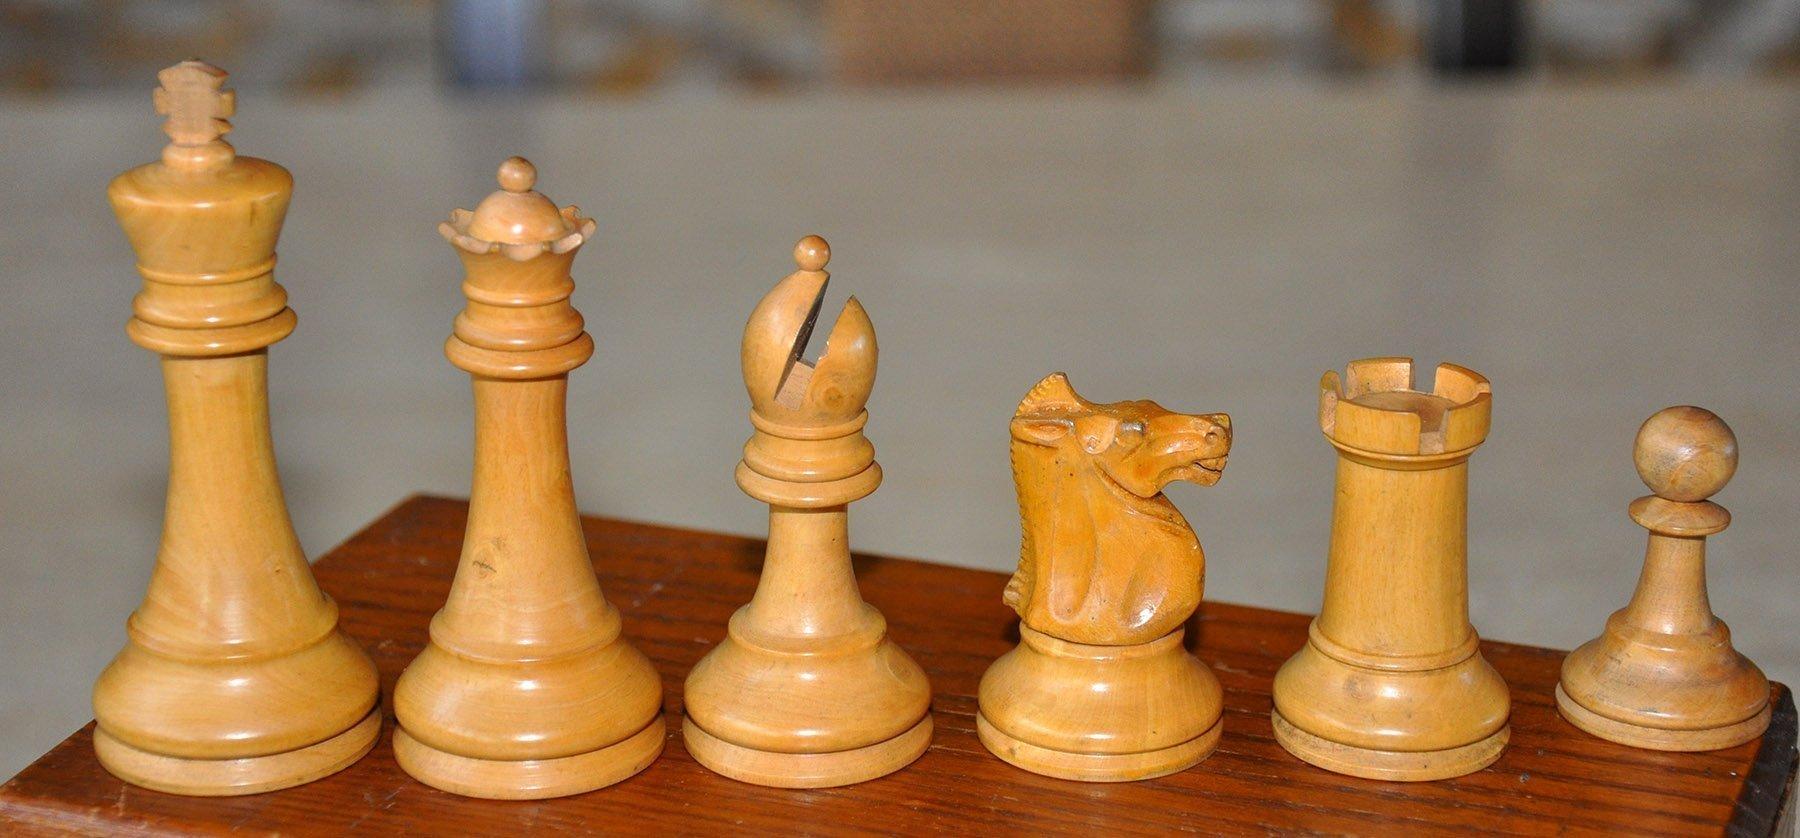 Popular Staunton Antique Chess Set 3 1 2 Quot King Www